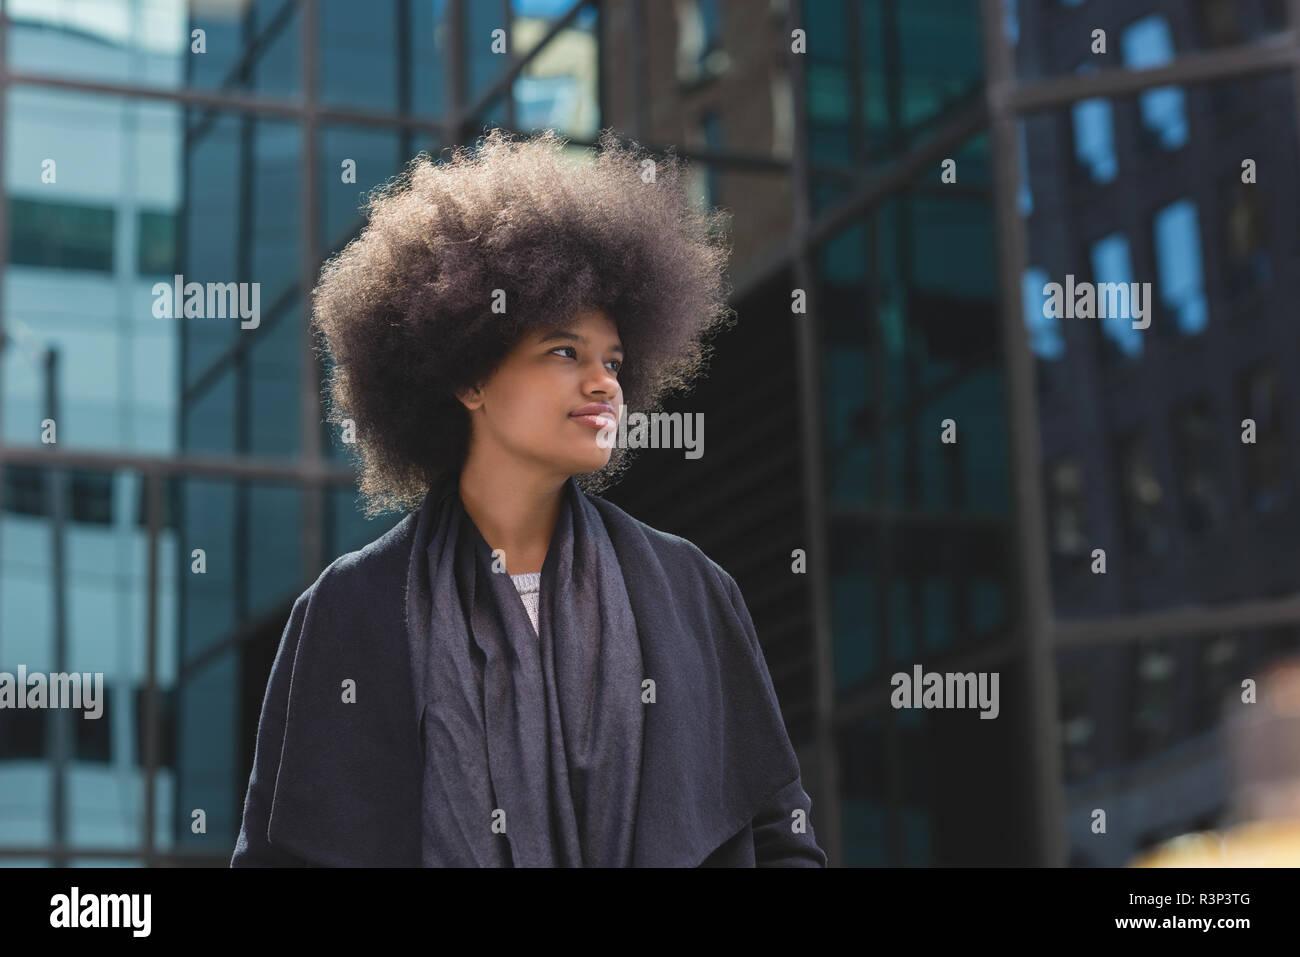 Afro woman walking on street - Stock Image